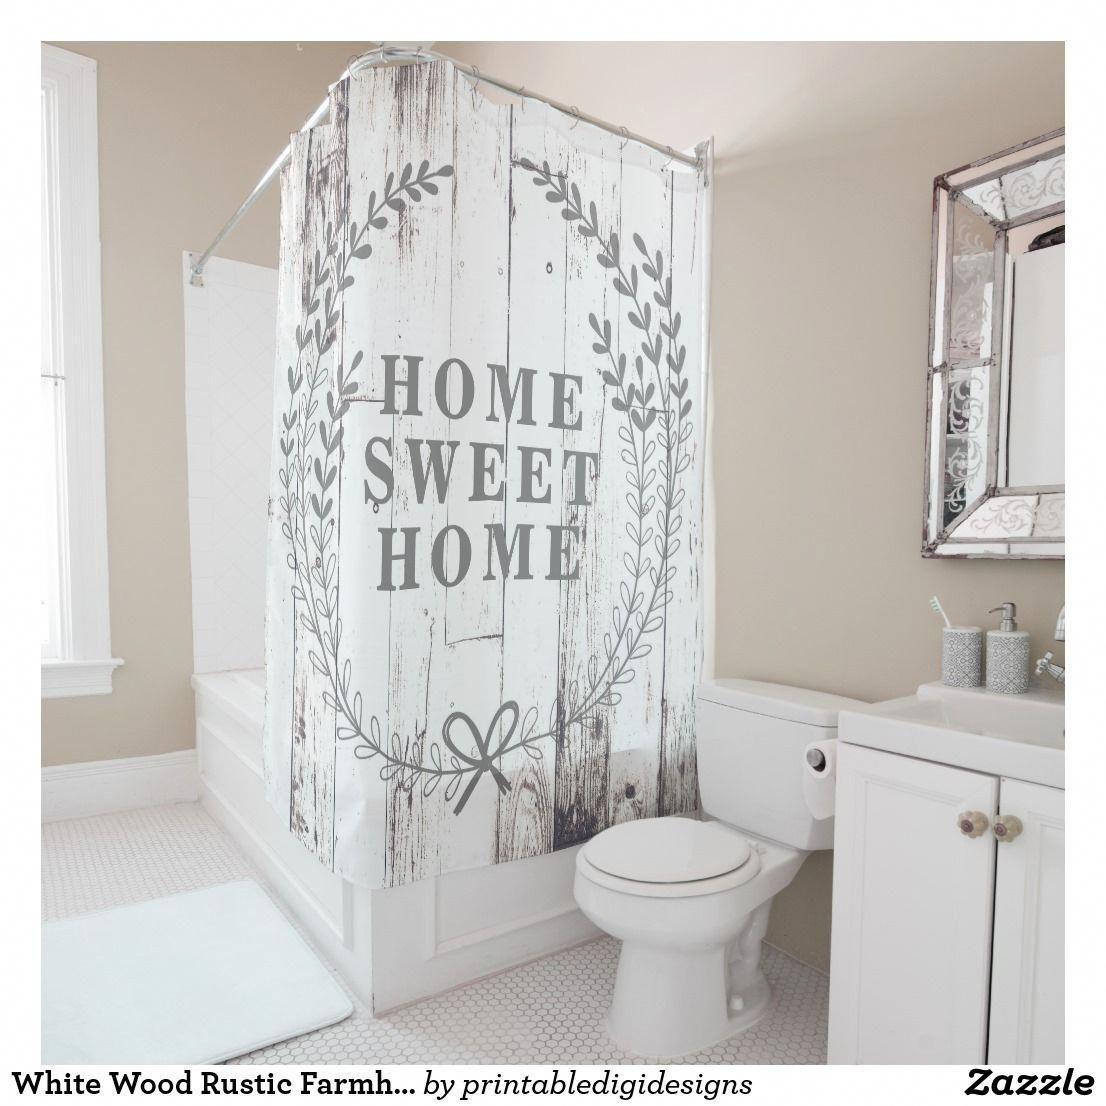 Purchase White Wood Rustic Farmhouse Home Sweet Home Shower Curtain farmhousedecor Shabbychicbathrooms